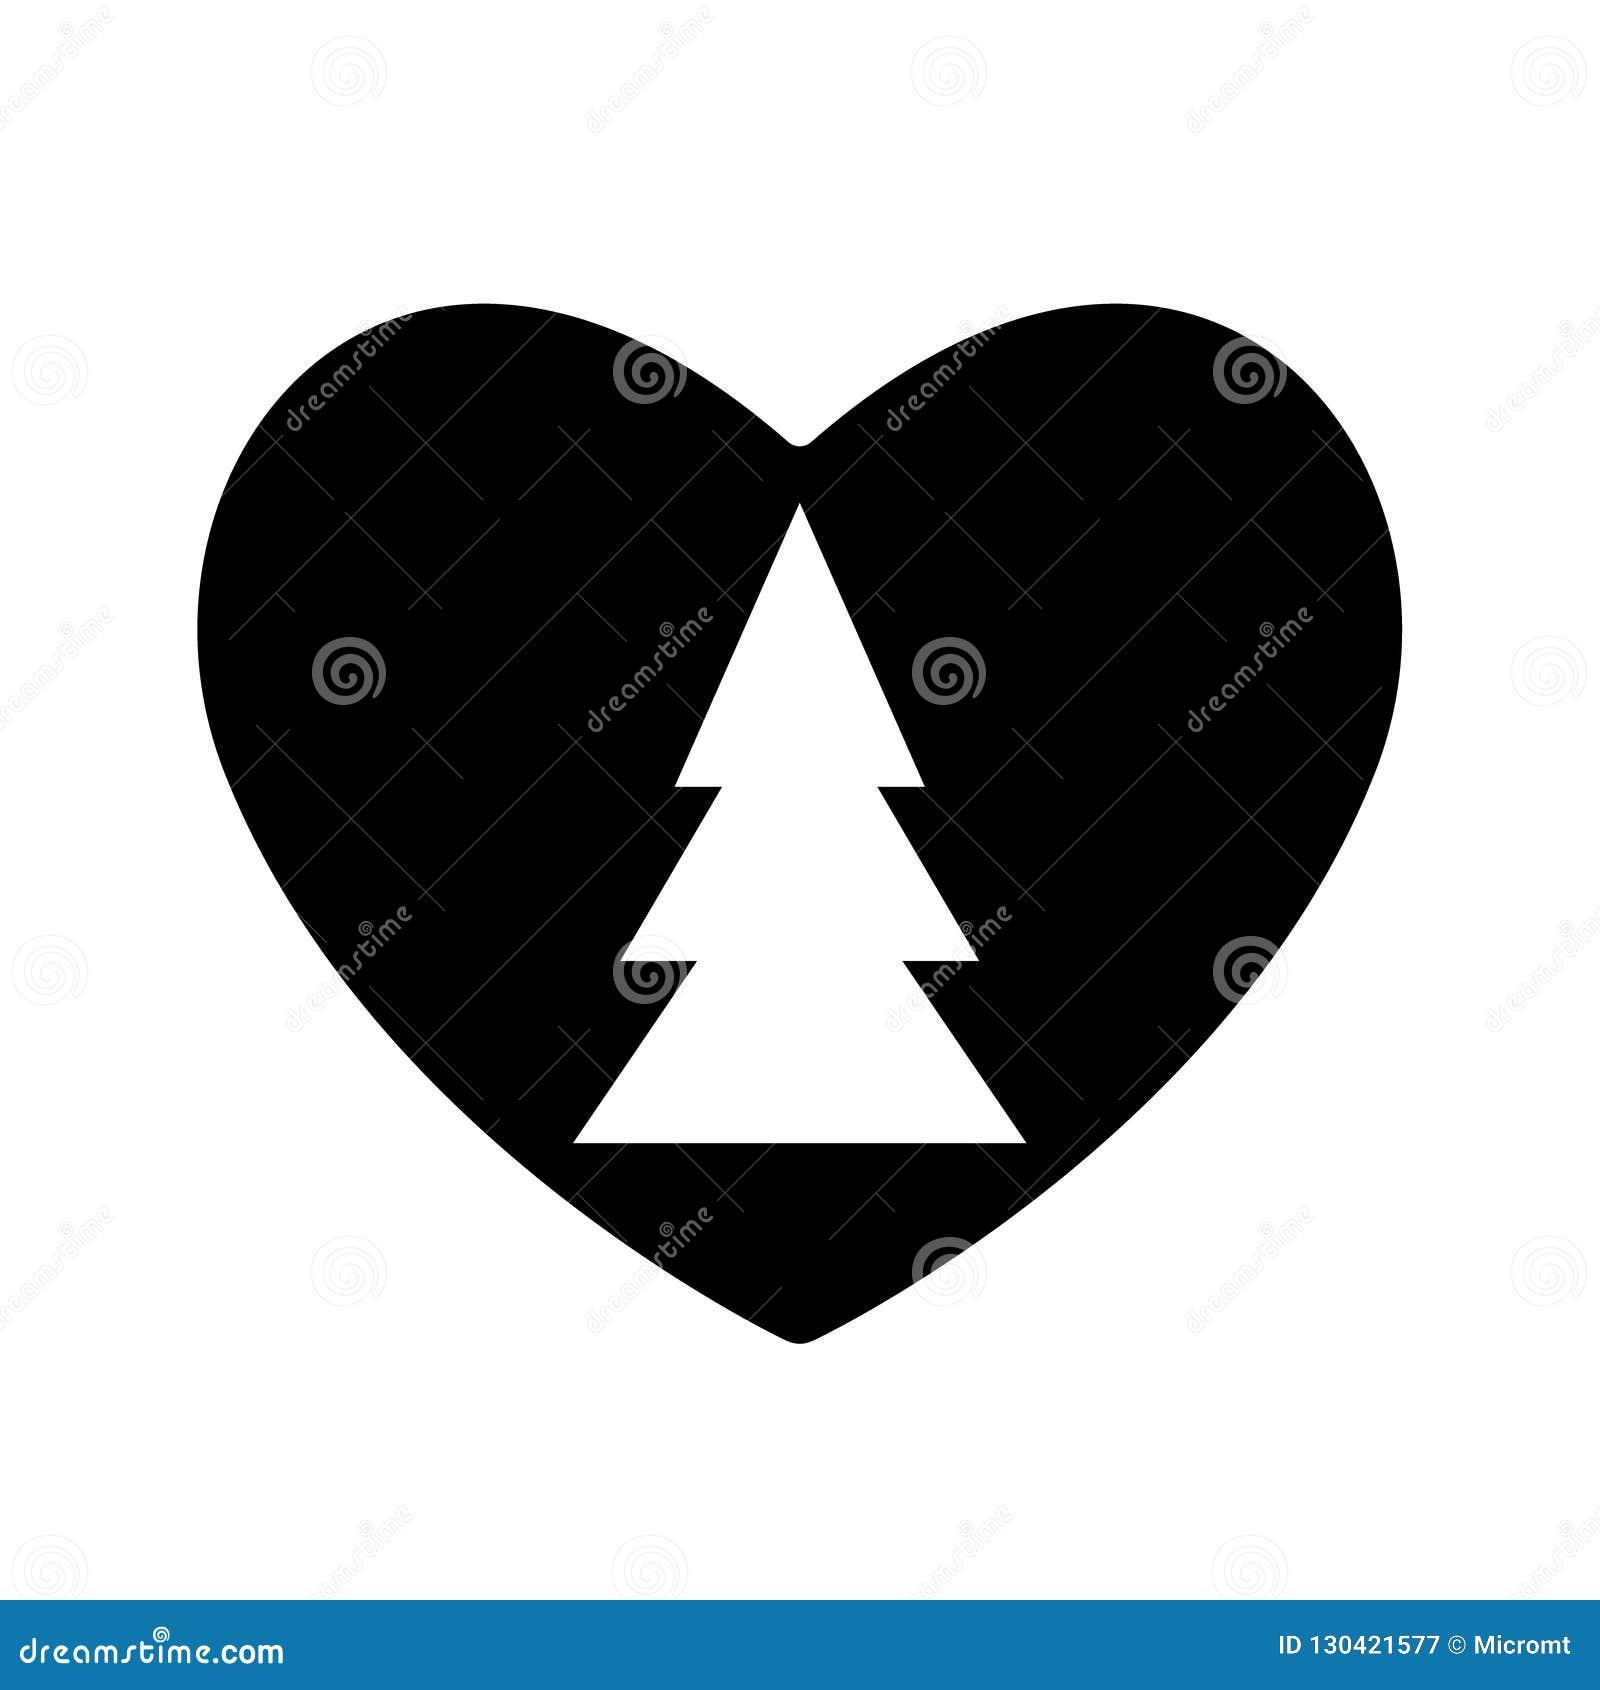 Christmas tree icon black in heart valentine. Symbol New Year love. Sample silhouette flat simple design. Fir-tree bazaar, fair of